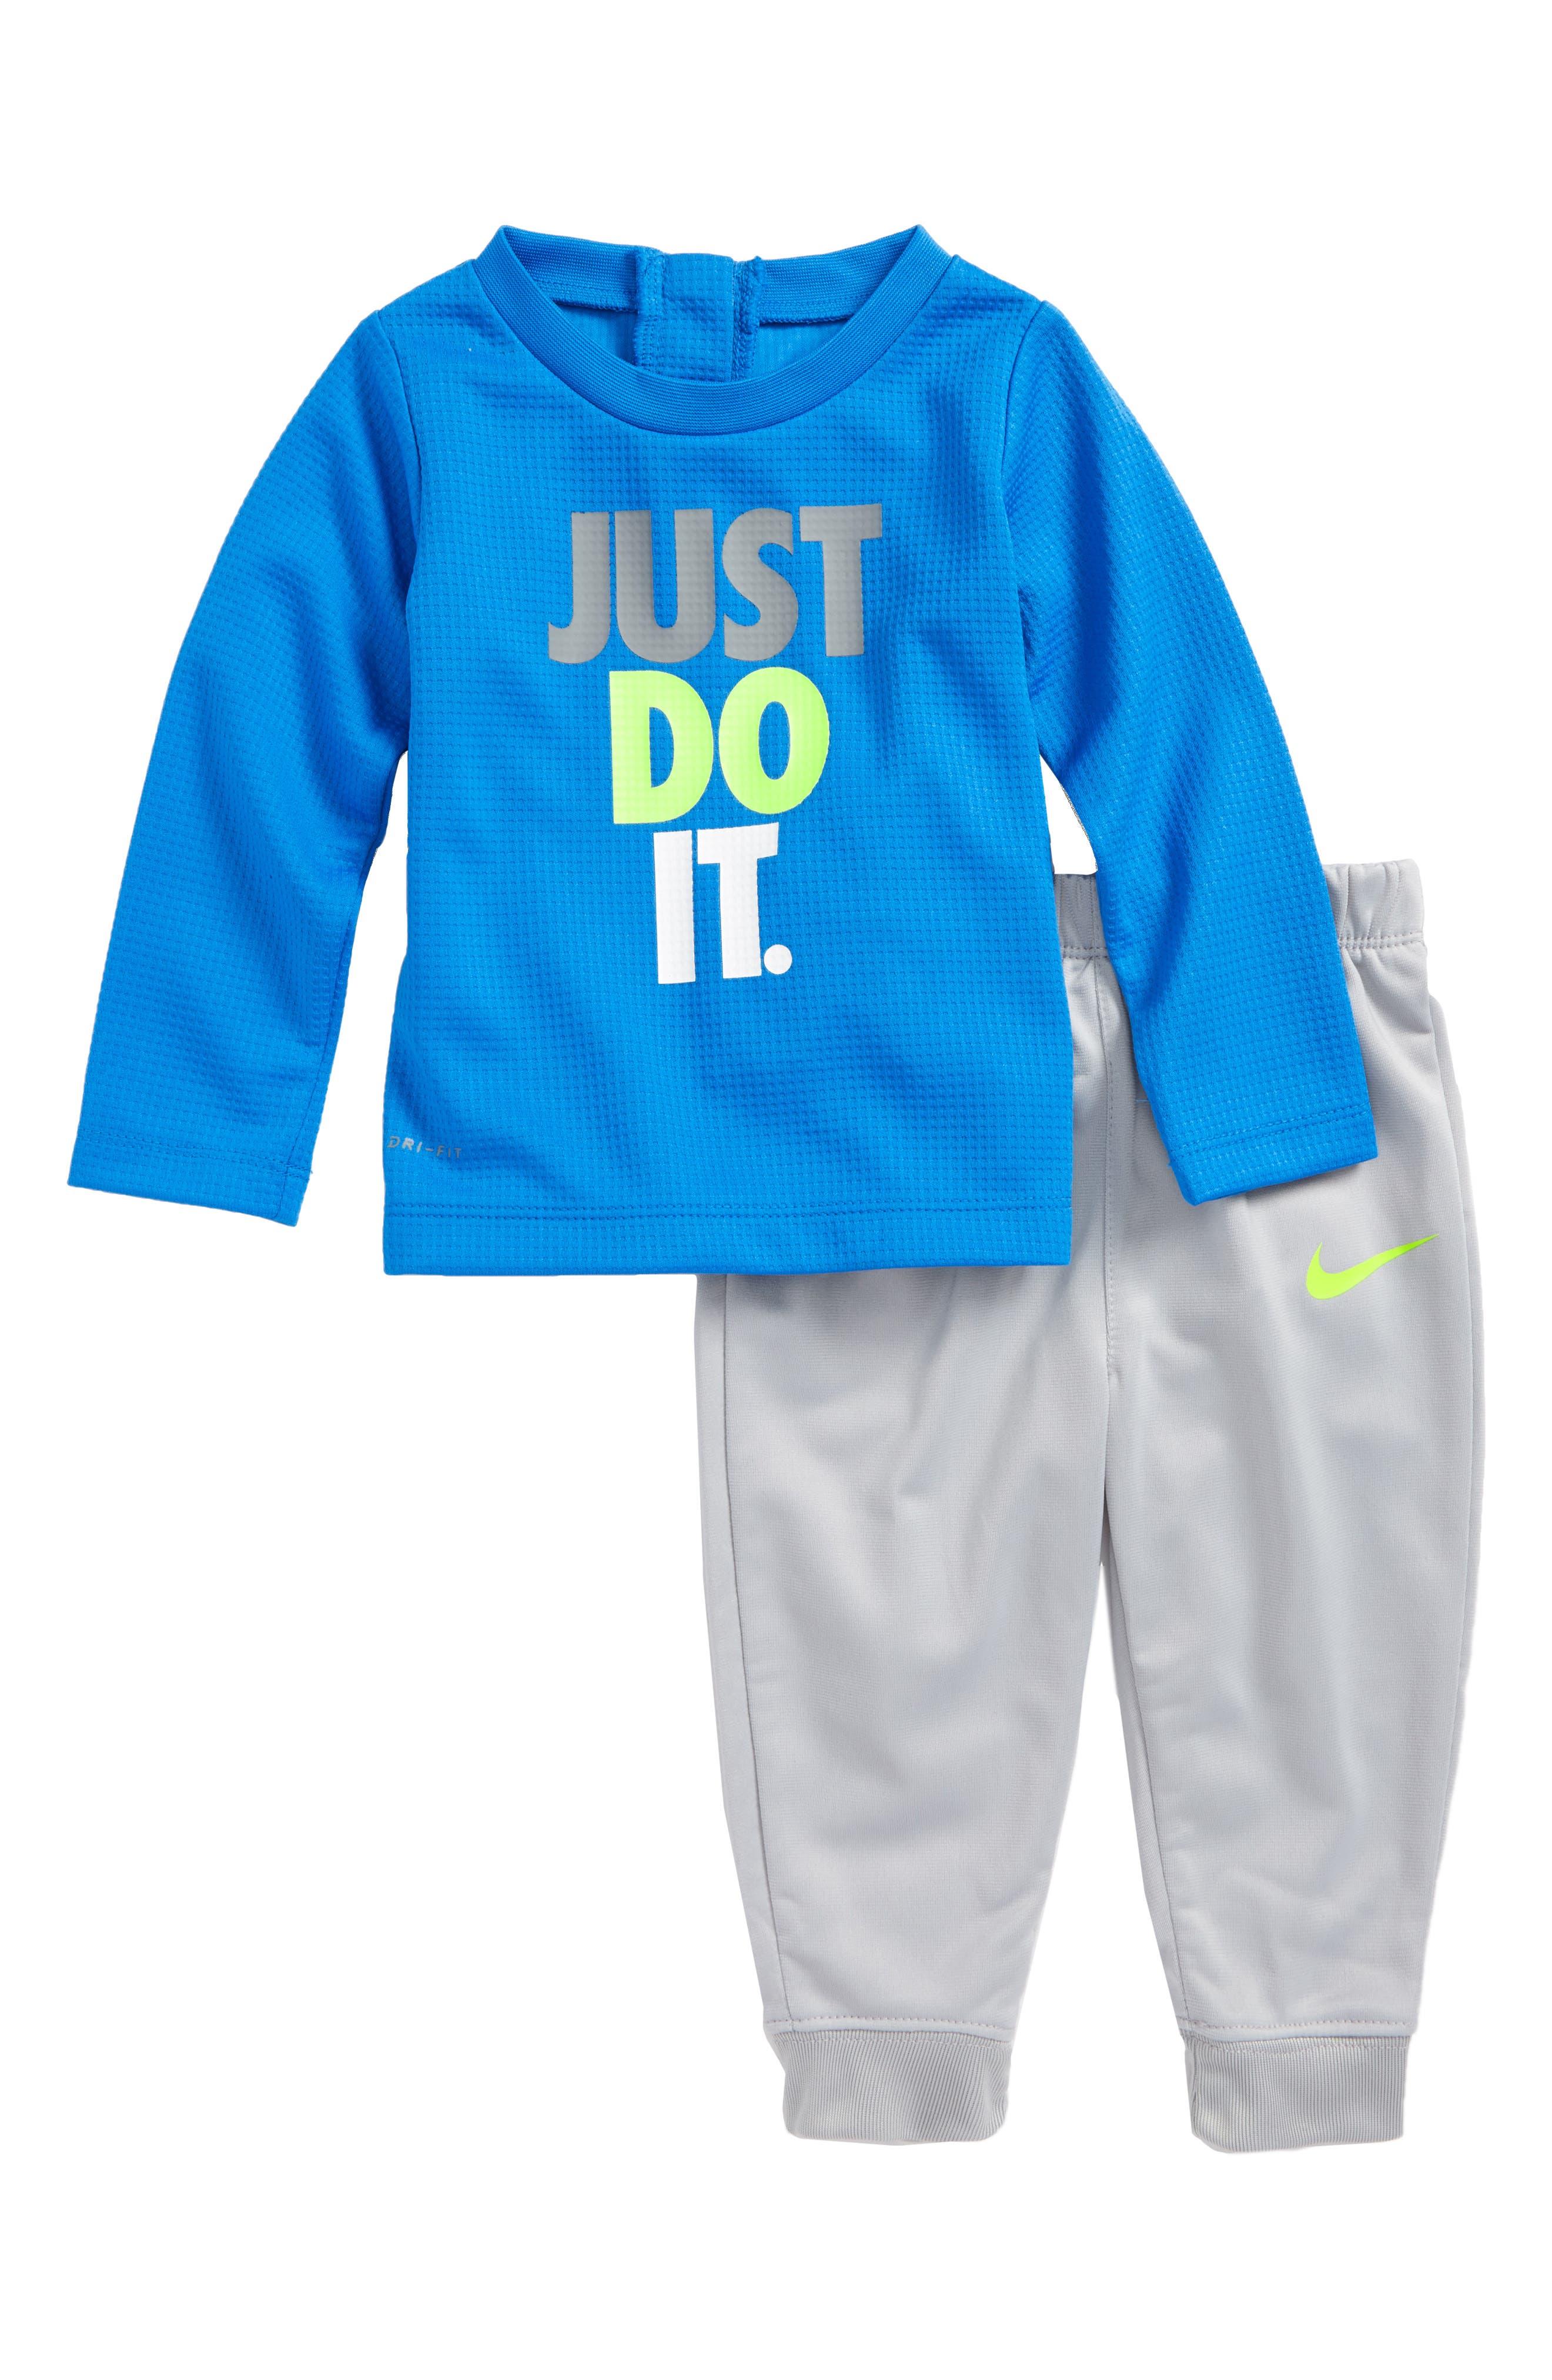 Main Image - Nike Dry Thermal Top & Sweatpants Set (Baby Boys)